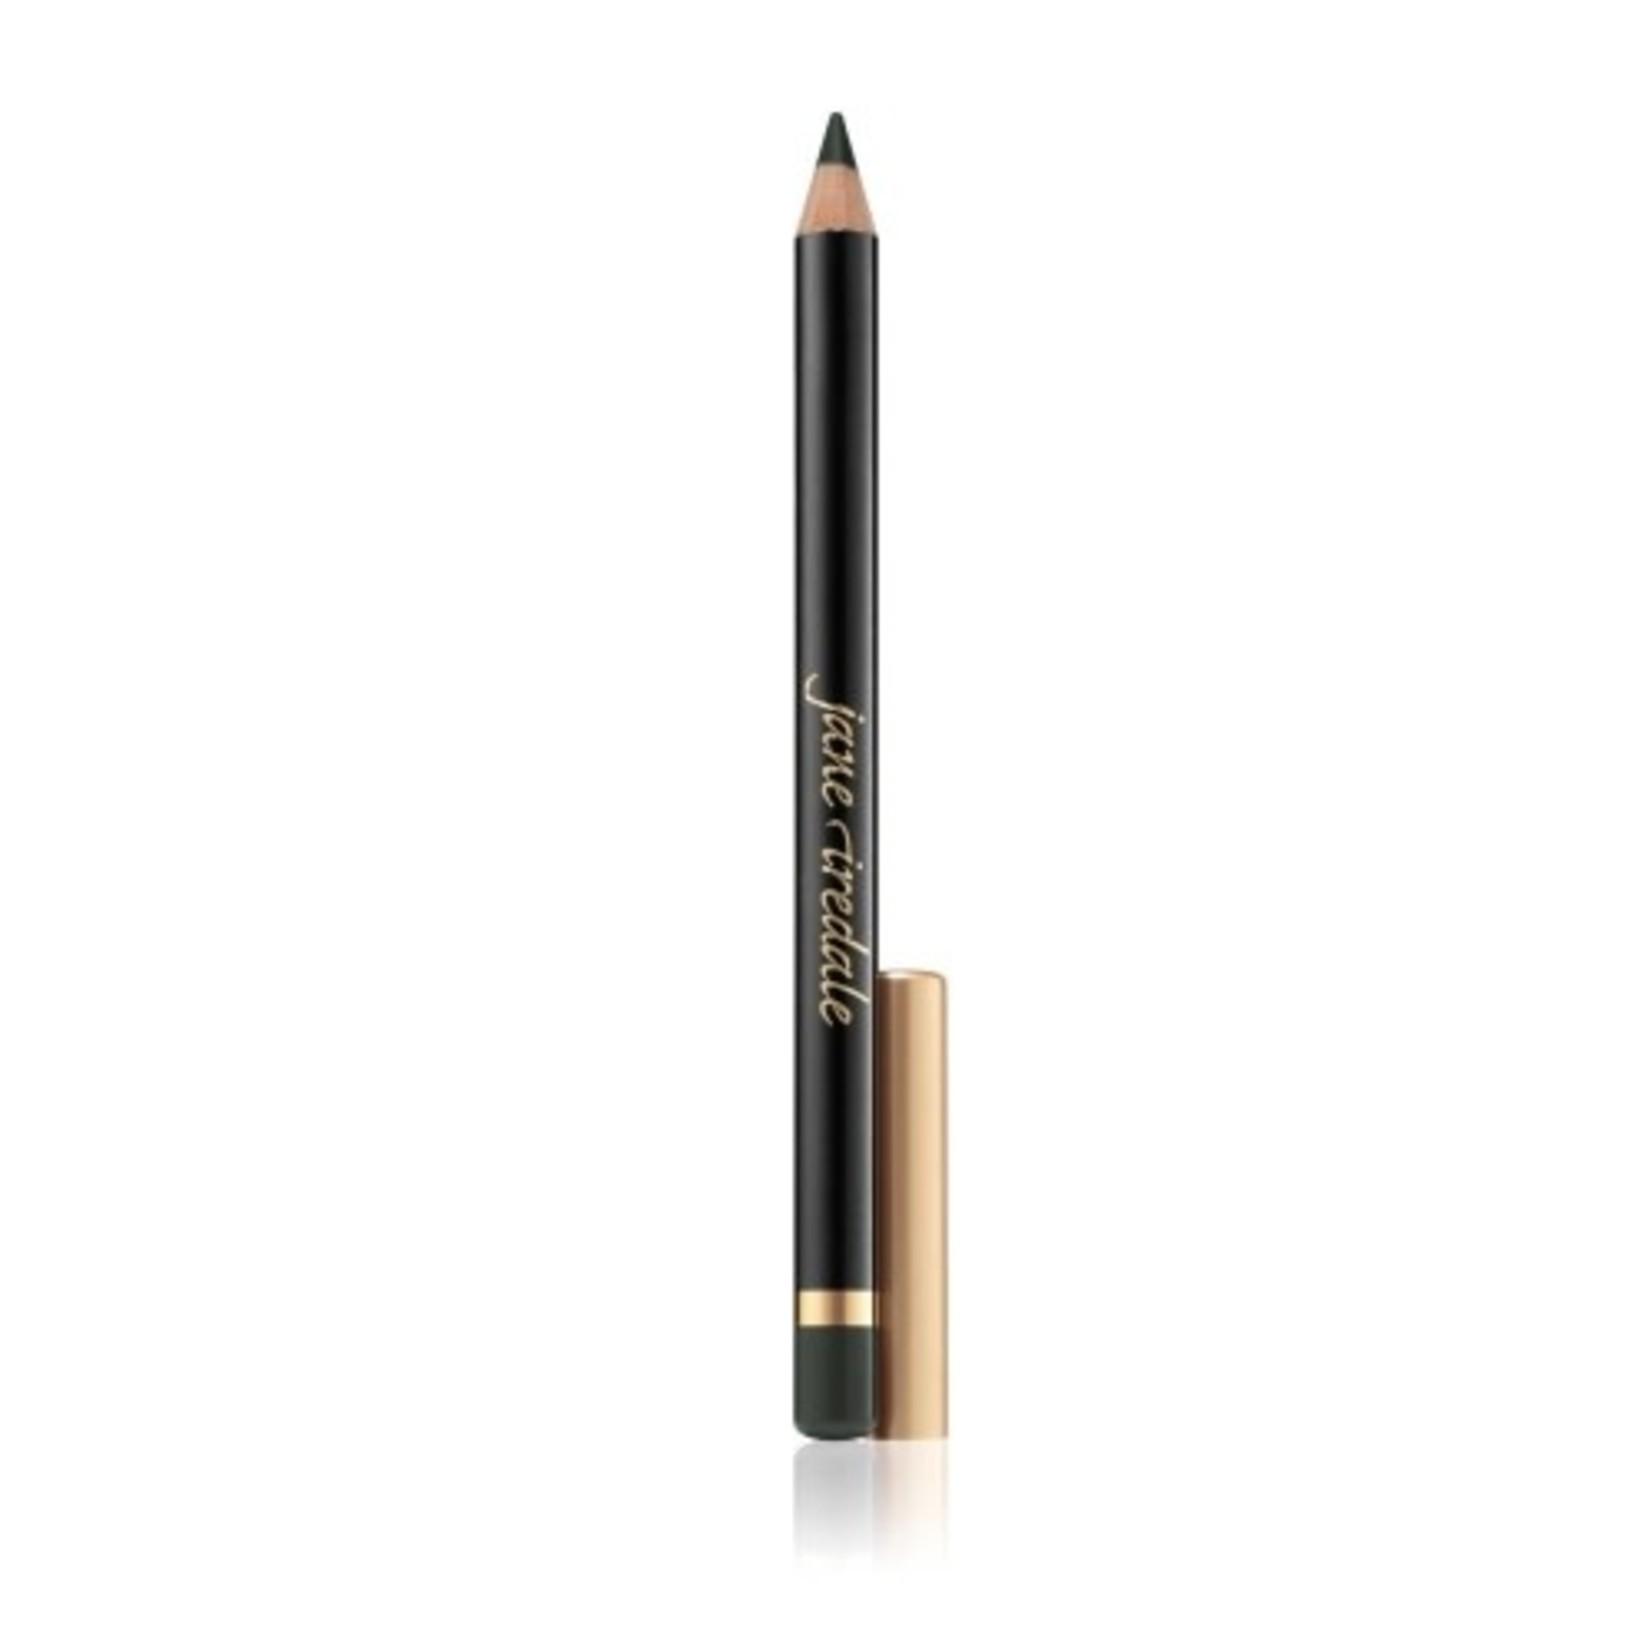 jane iredale Eye pencil black/grey